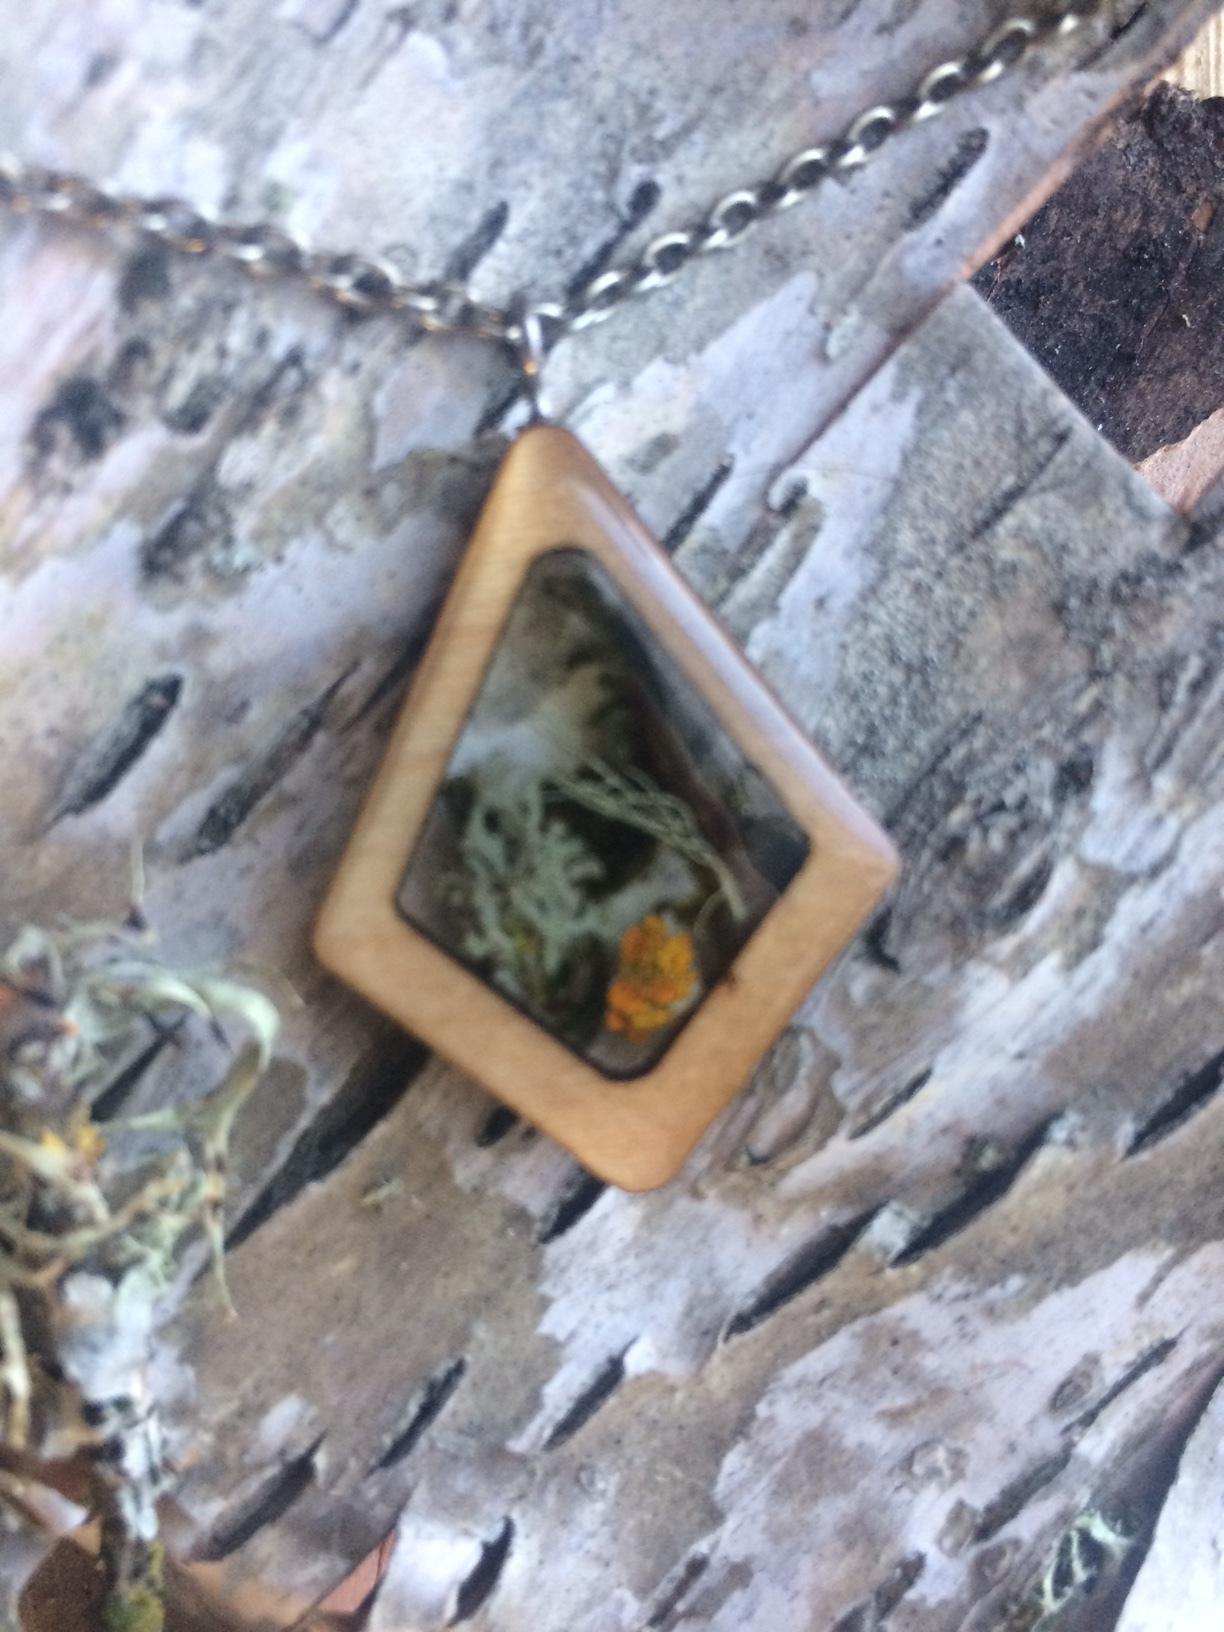 lichenquadsmallnecklace2.JPG